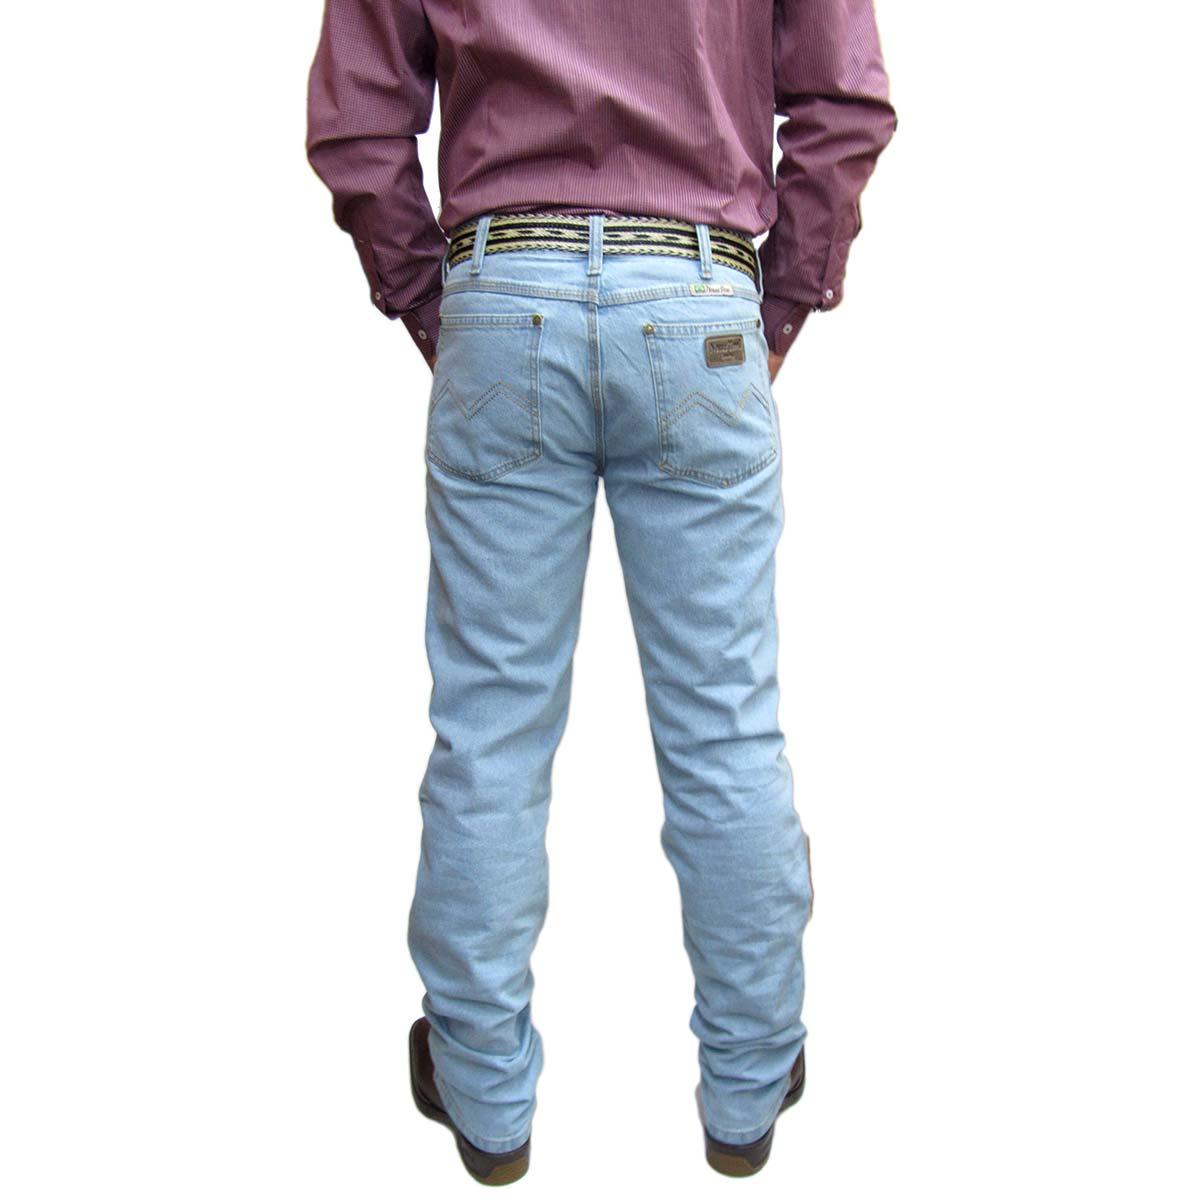 ed6d2f4c32385a Kit 3 Calças Jeans Country Masculina Nossa Terra Farm Tradicional ...